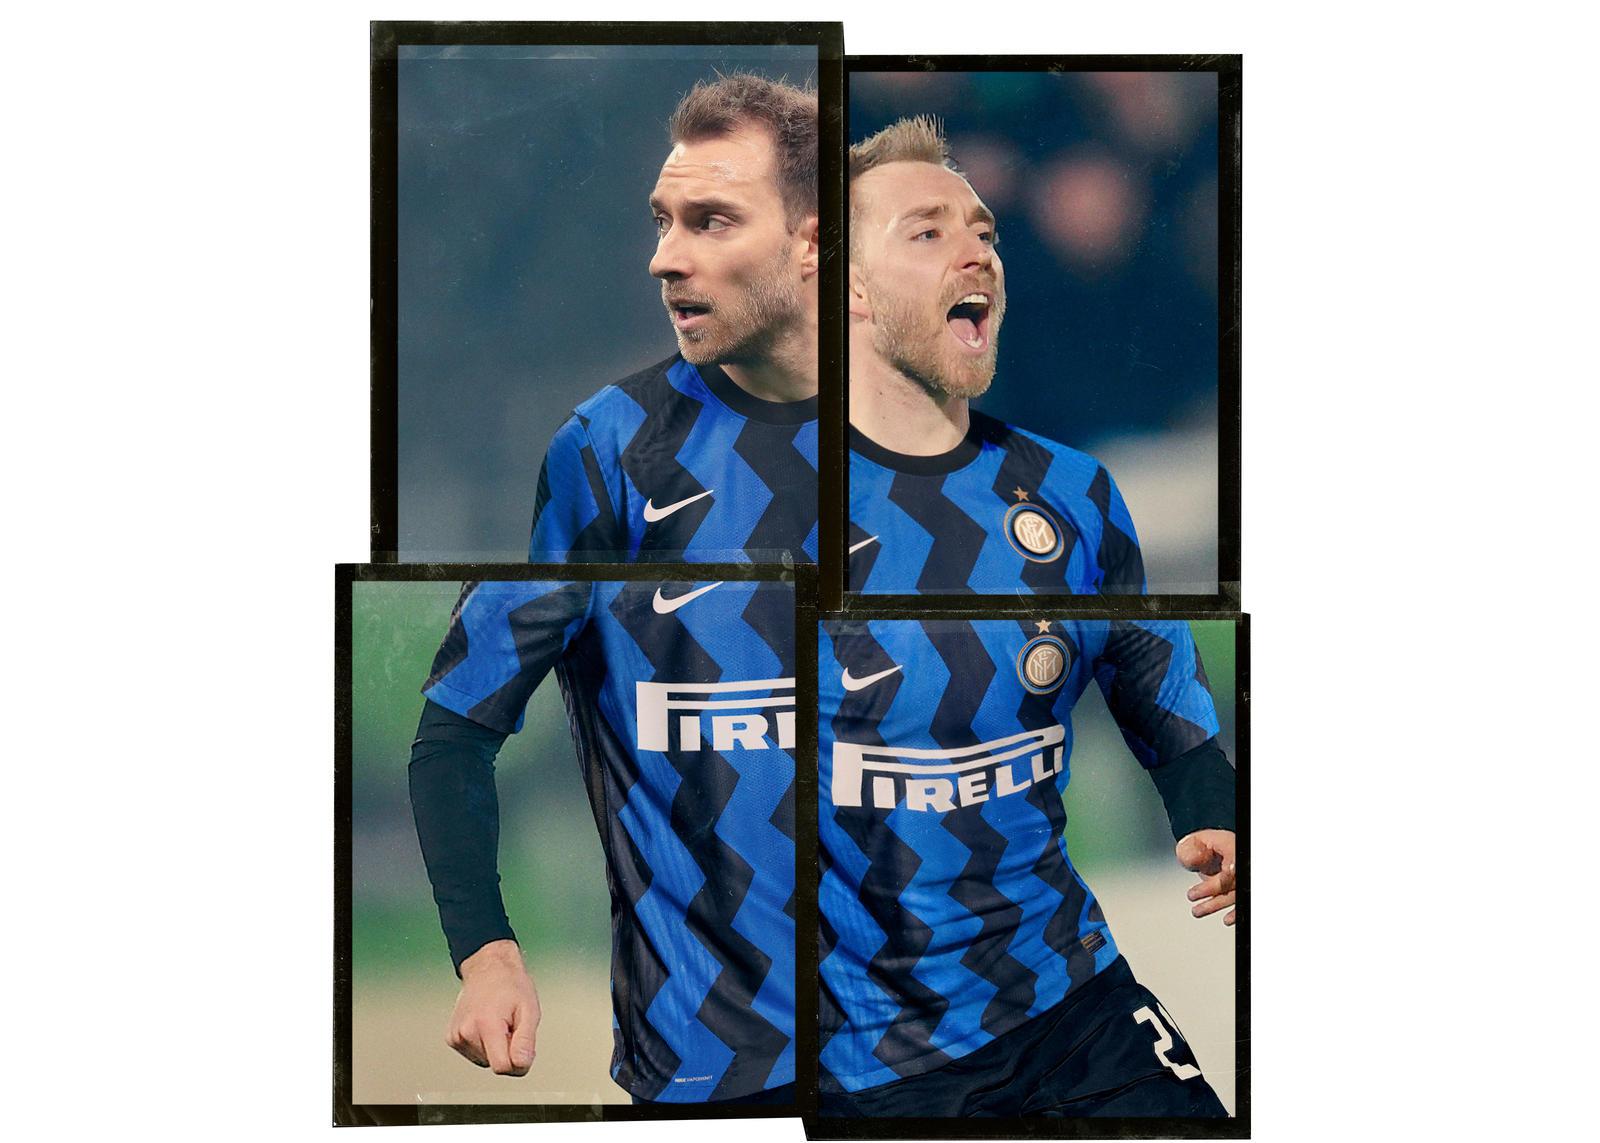 Fc Internazionale Milano 2020 21 Home Kit Nike News